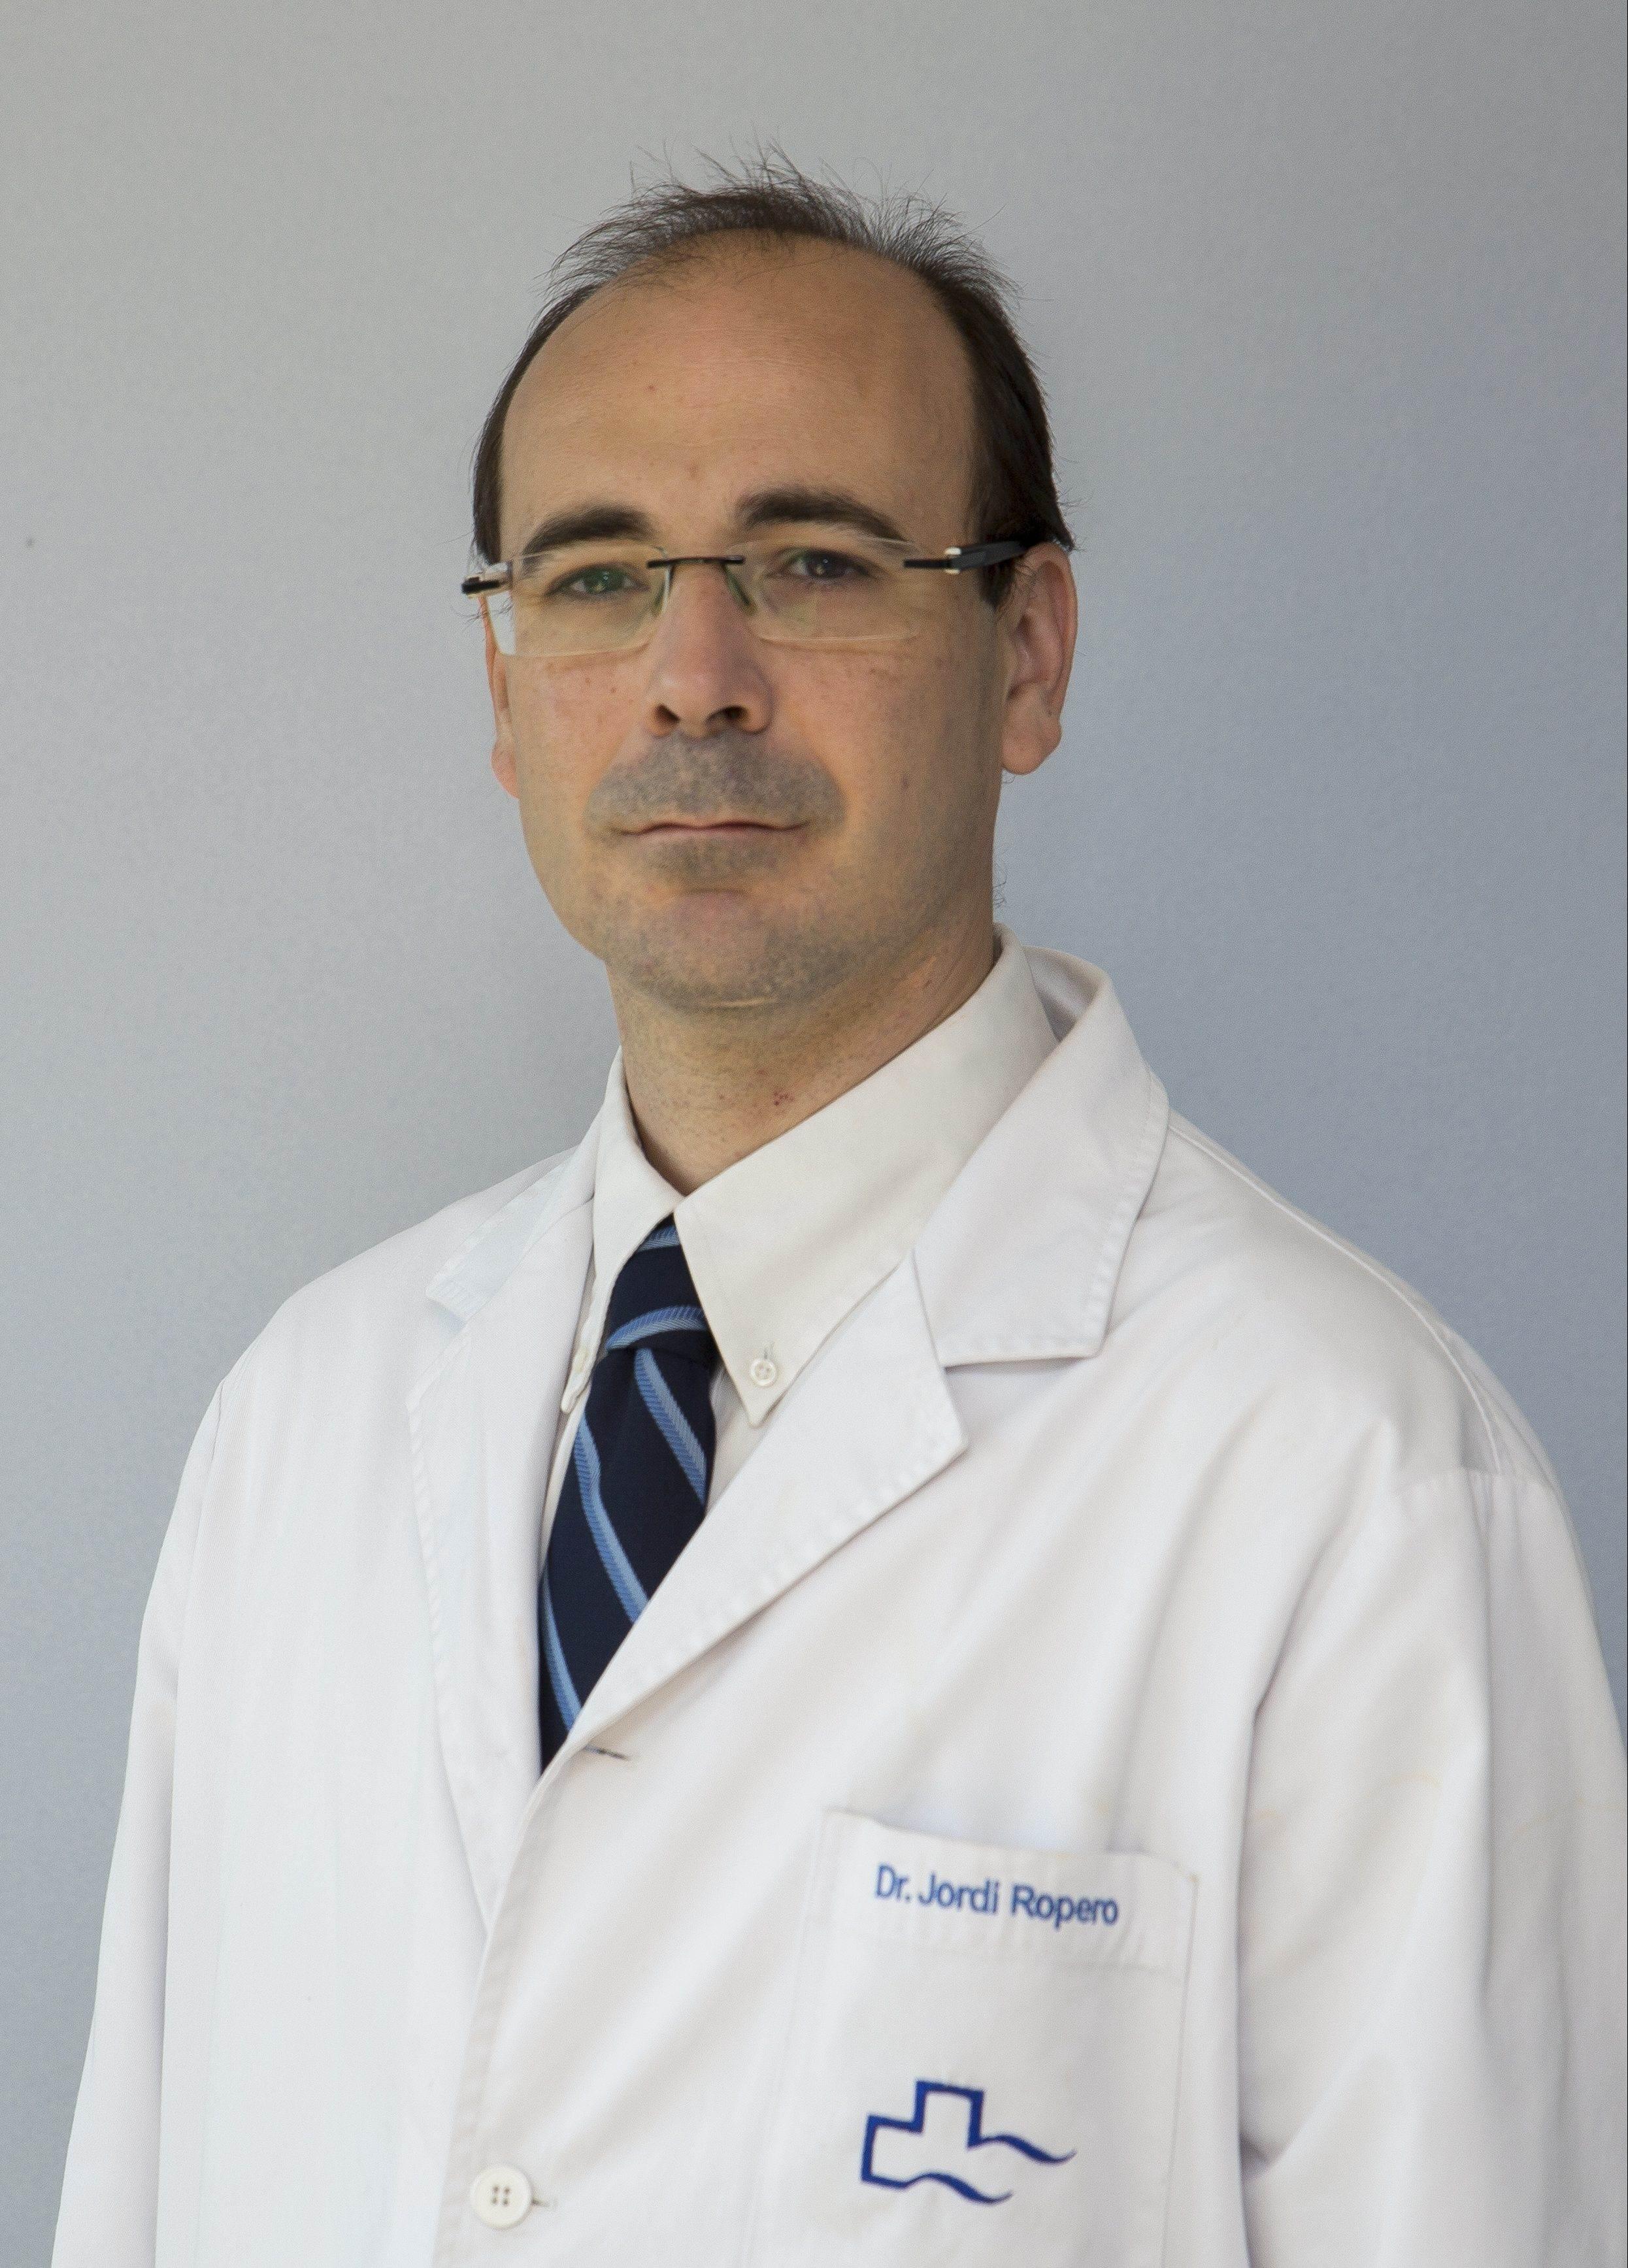 Dr Jordi Ropero